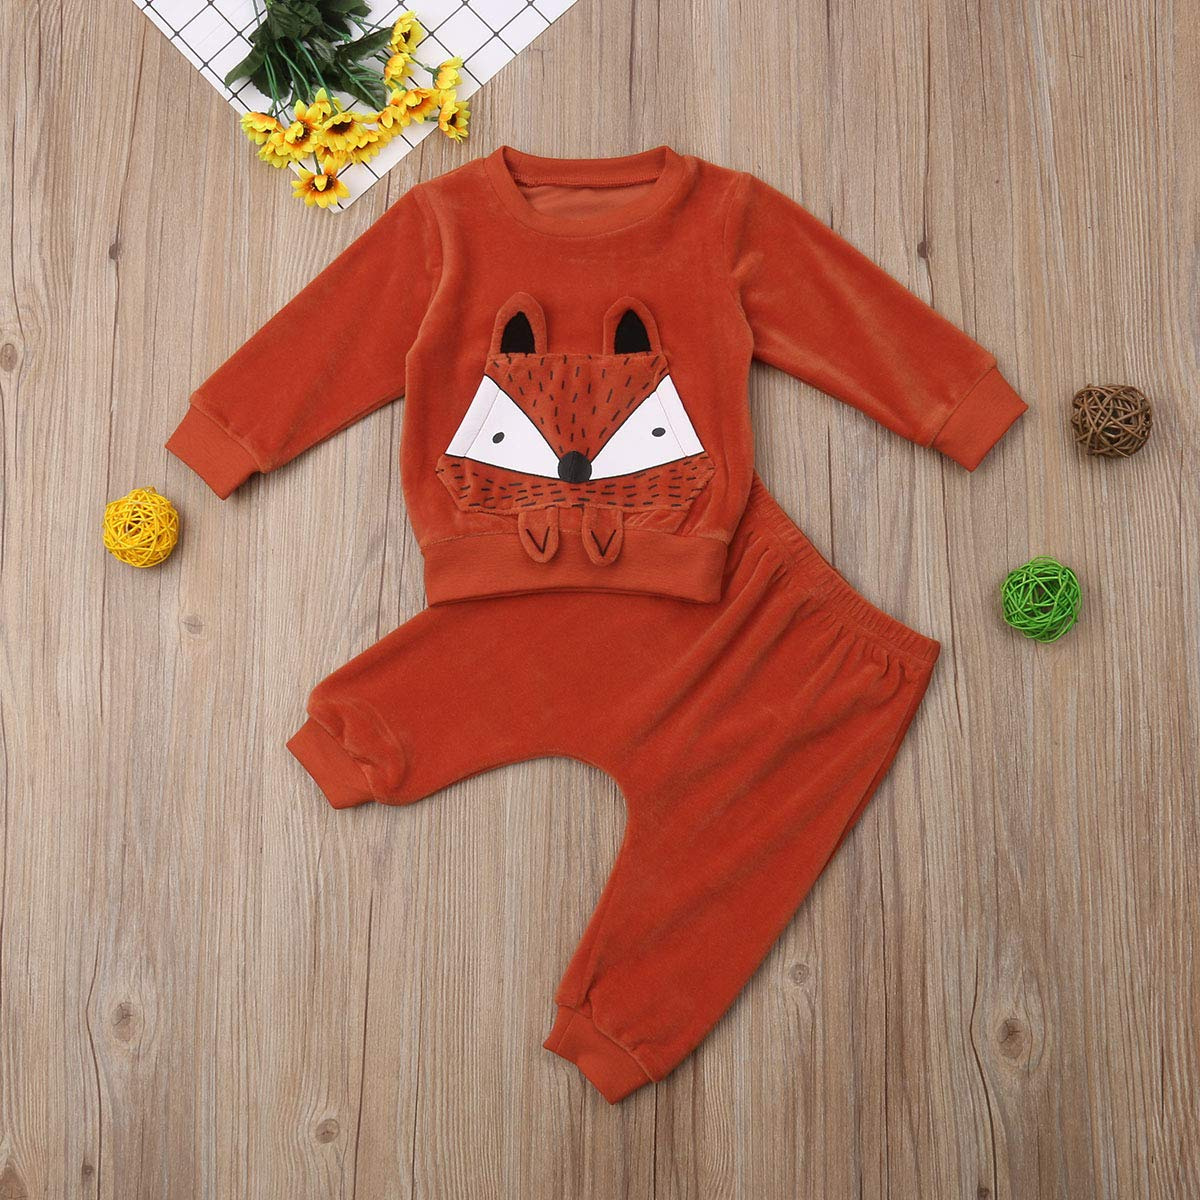 Toddler Newborn Baby Boys Girls 2Pcs Warm Cute Fox Tops T-Shirt Long Pants Outfit